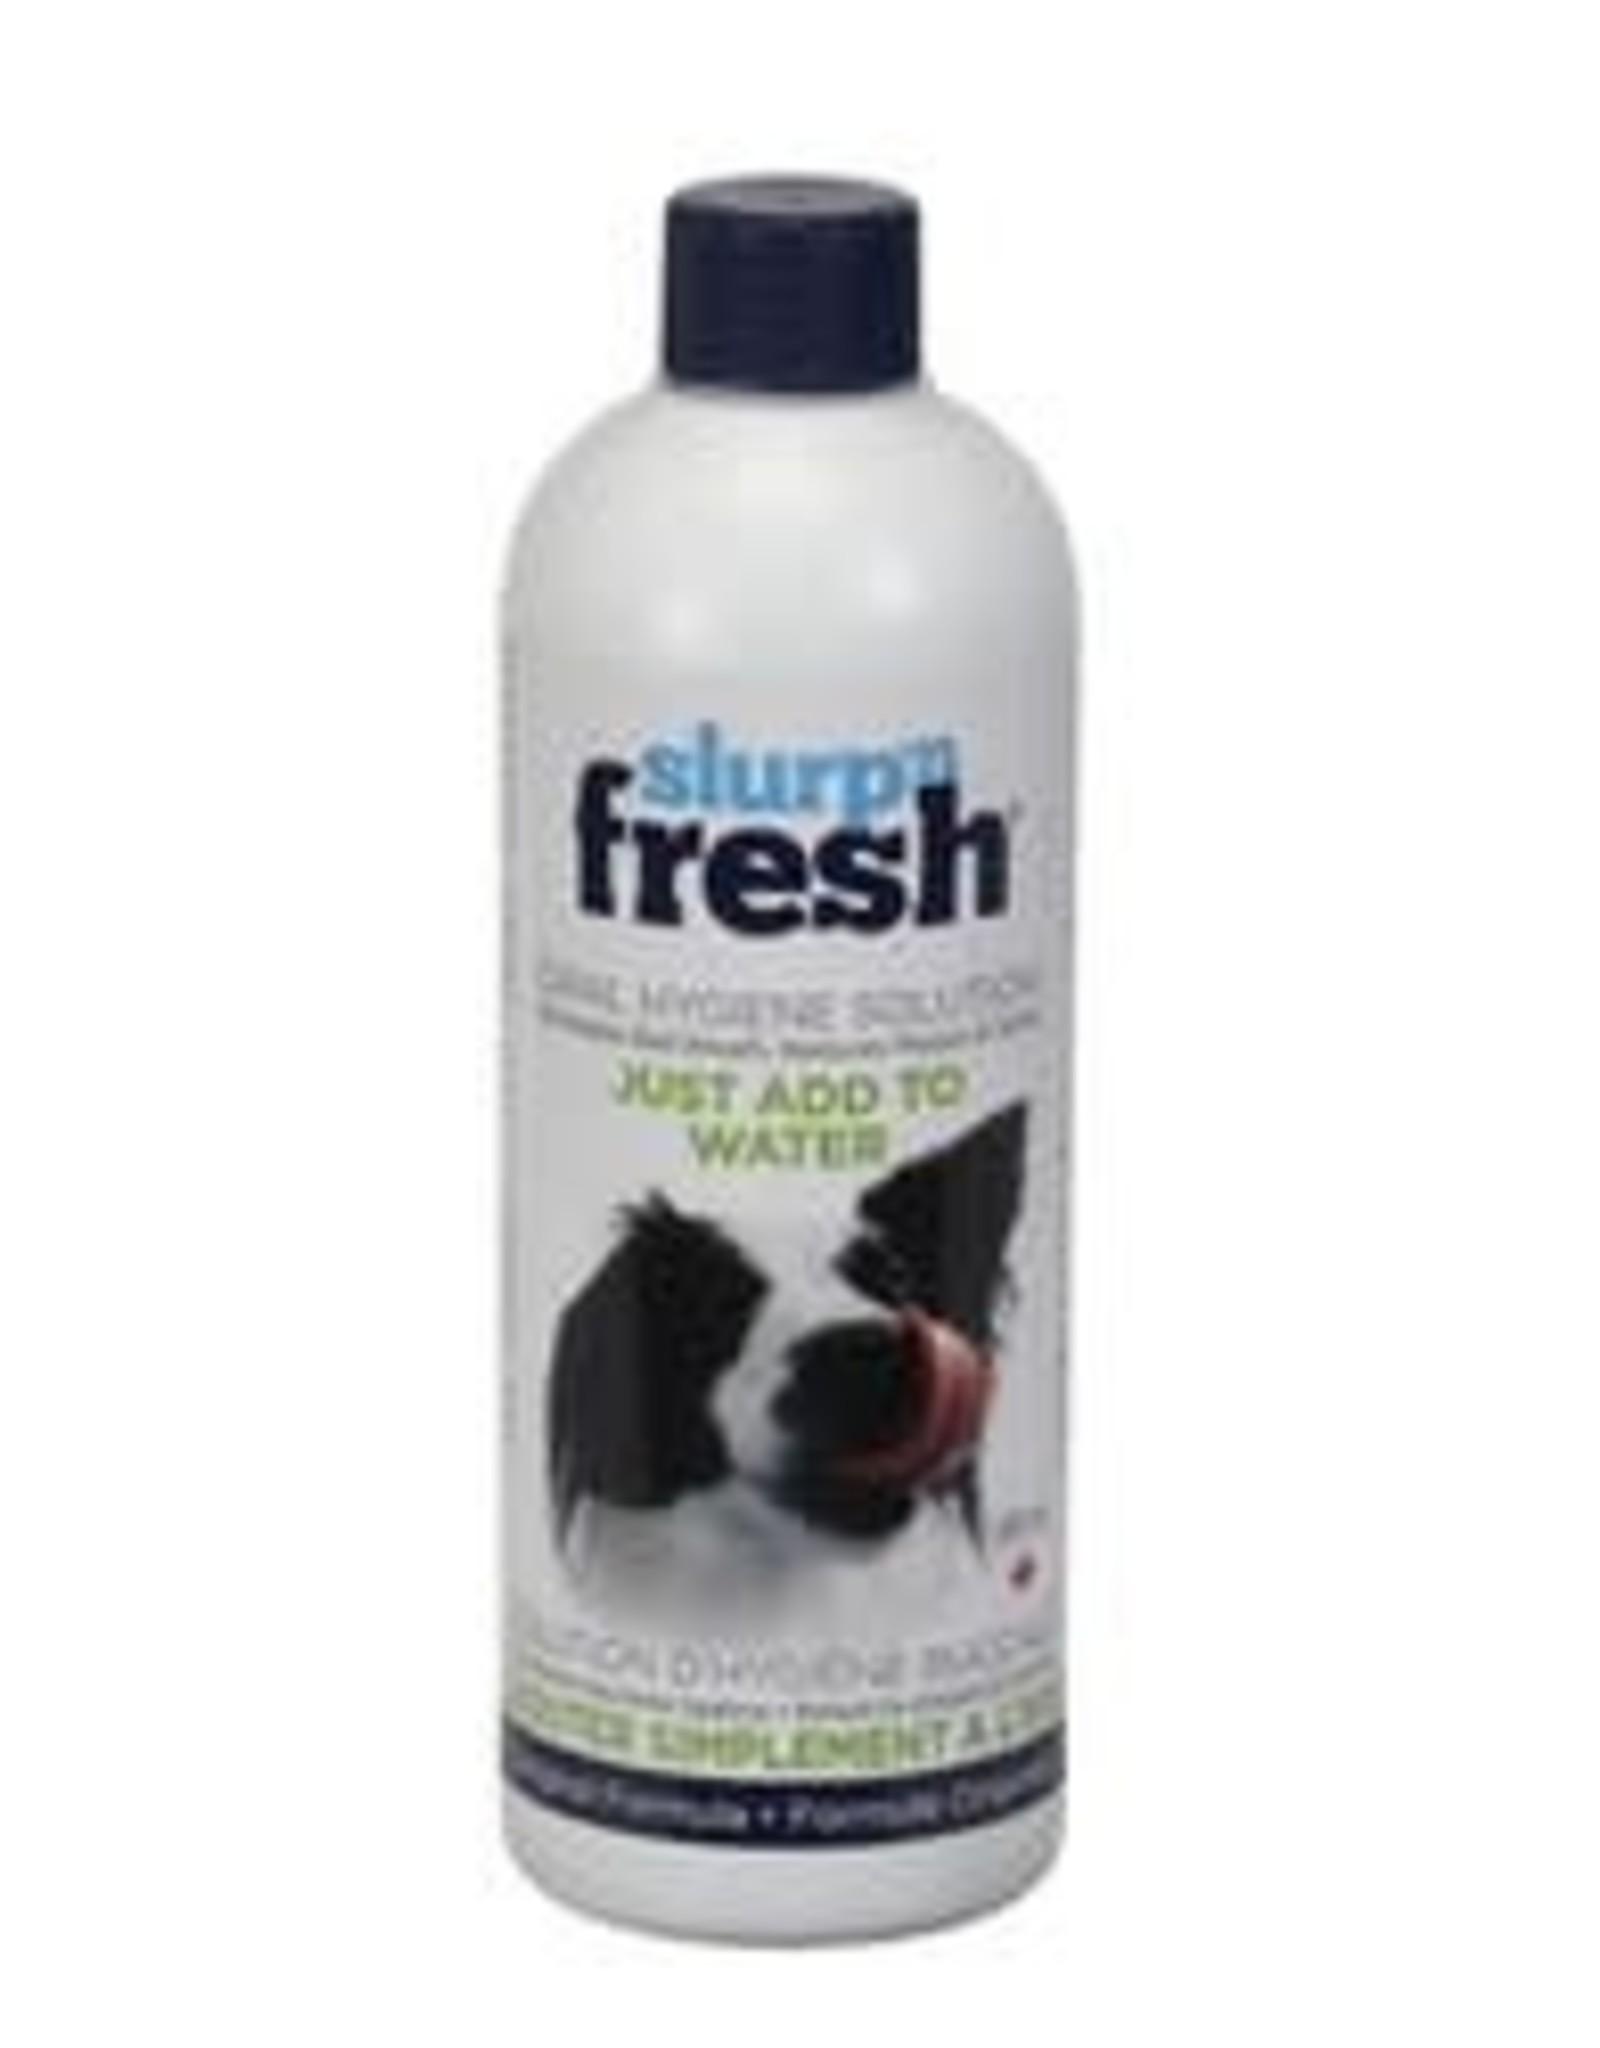 Enviro EnviroFresh Slurp 'n Fresh Breath Freshener 400ml